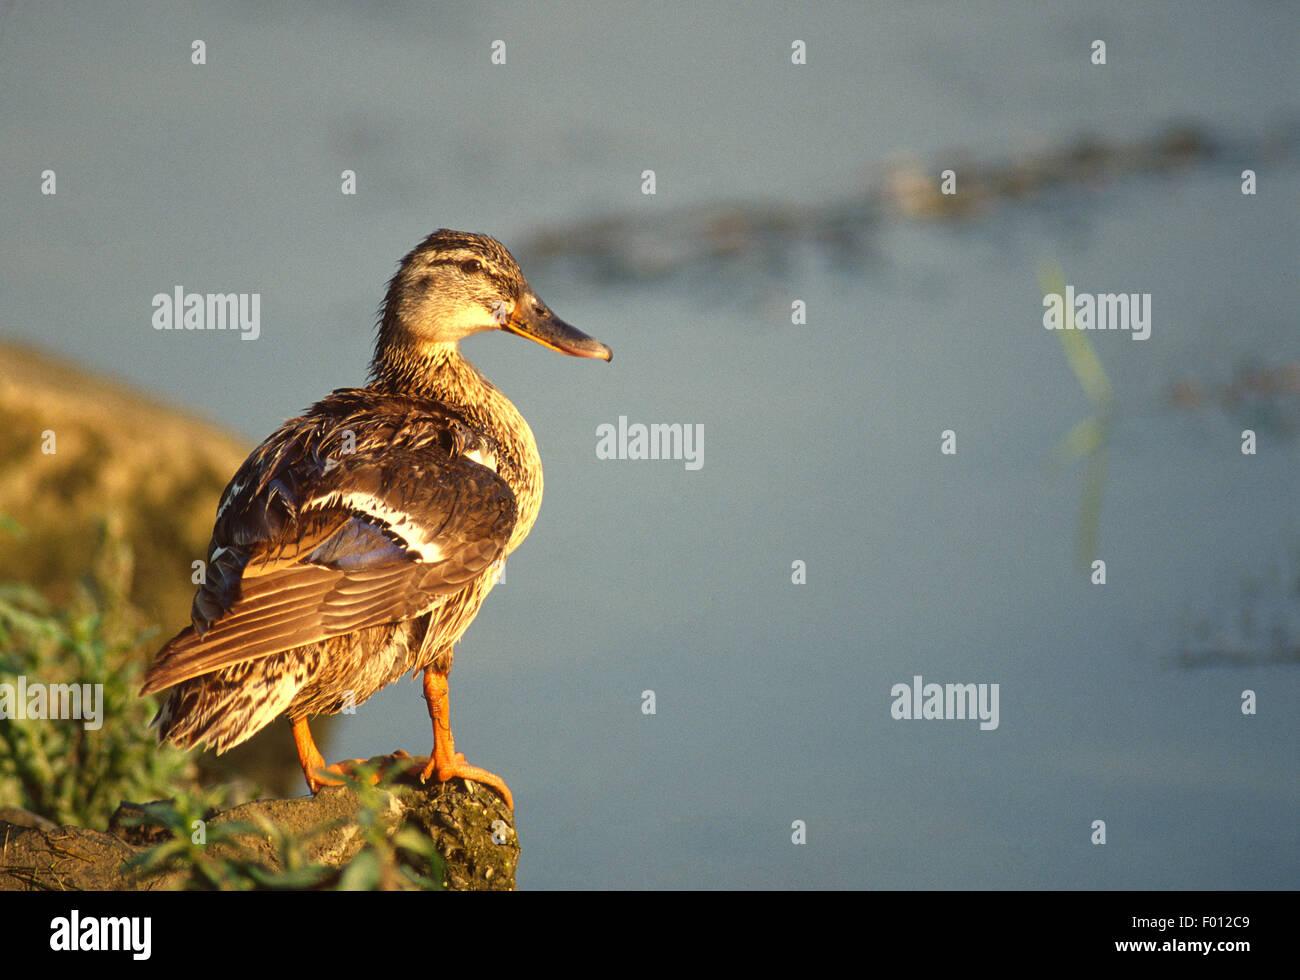 Female of mallard of wild duck (Anas platyrhynchos), Anatidae, Tiber River, Rome, Italy, Europe - Stock Image